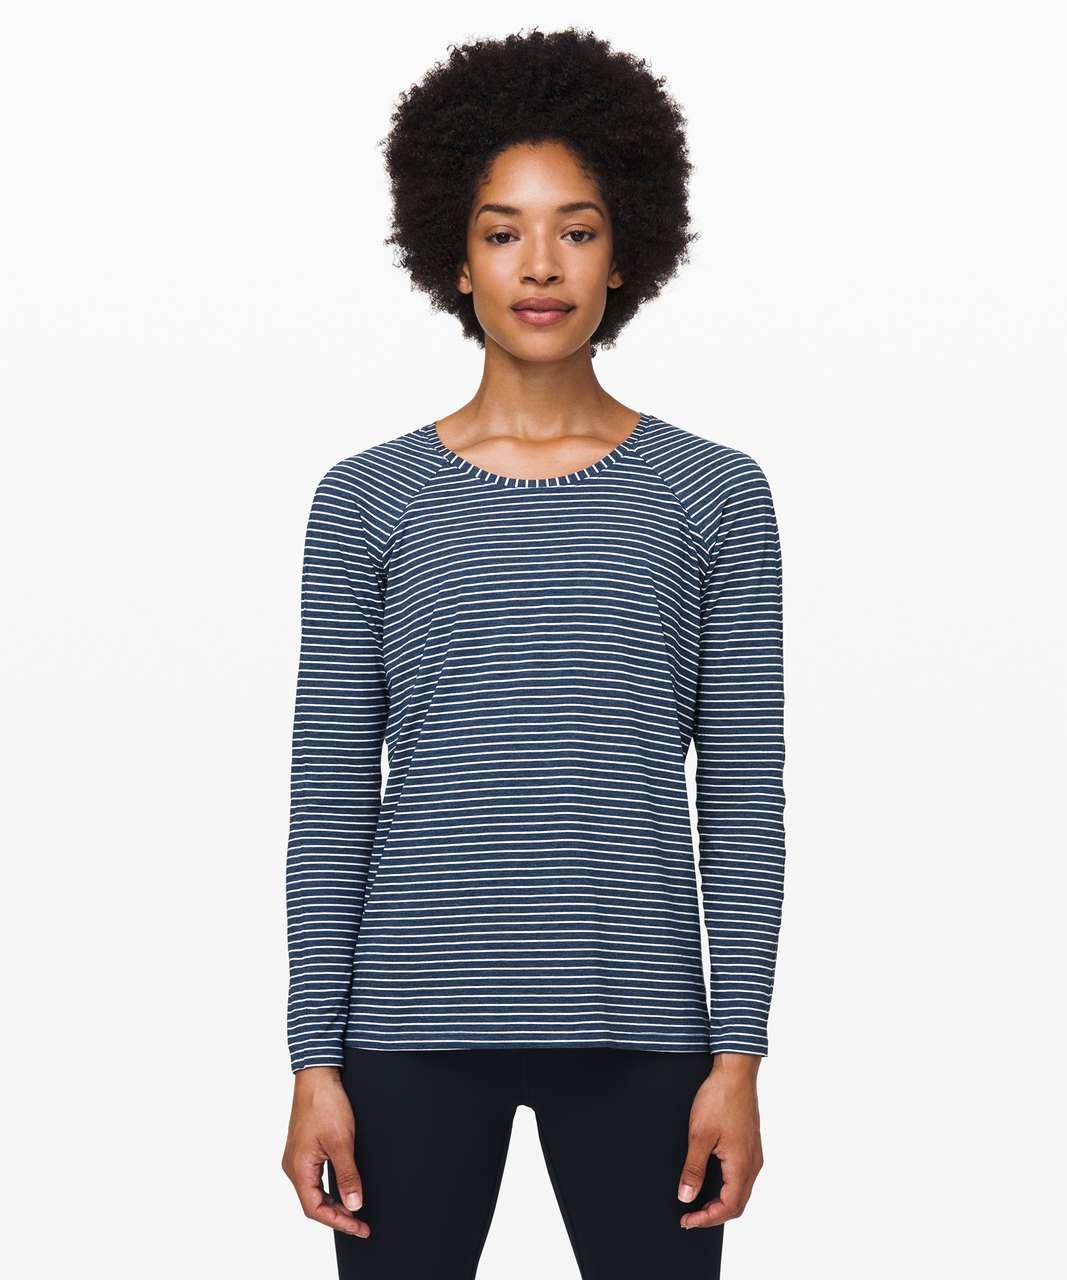 Lululemon Emerald Long Sleeve - Modern Stripe Heathered Code Blue White